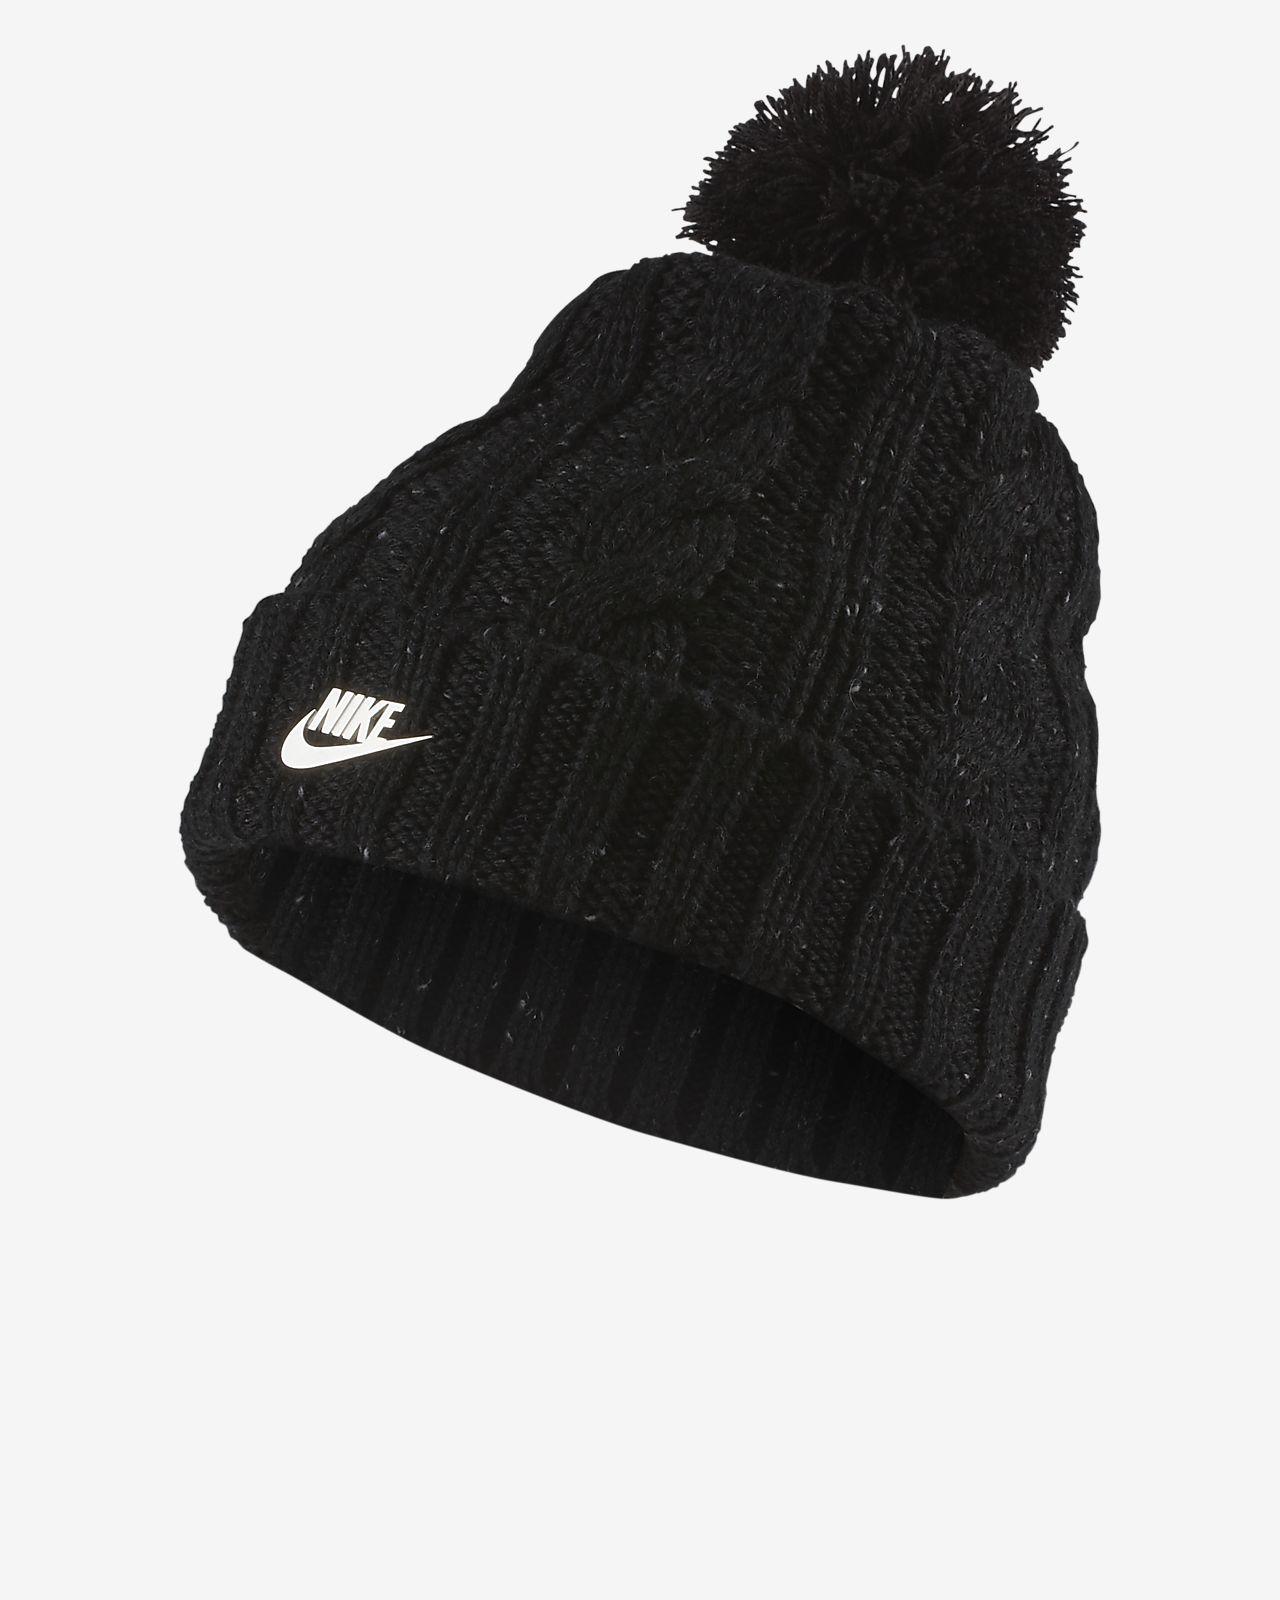 Nike Sportswear Beanie. Nike.com AU 5a8a0a8fb2a6